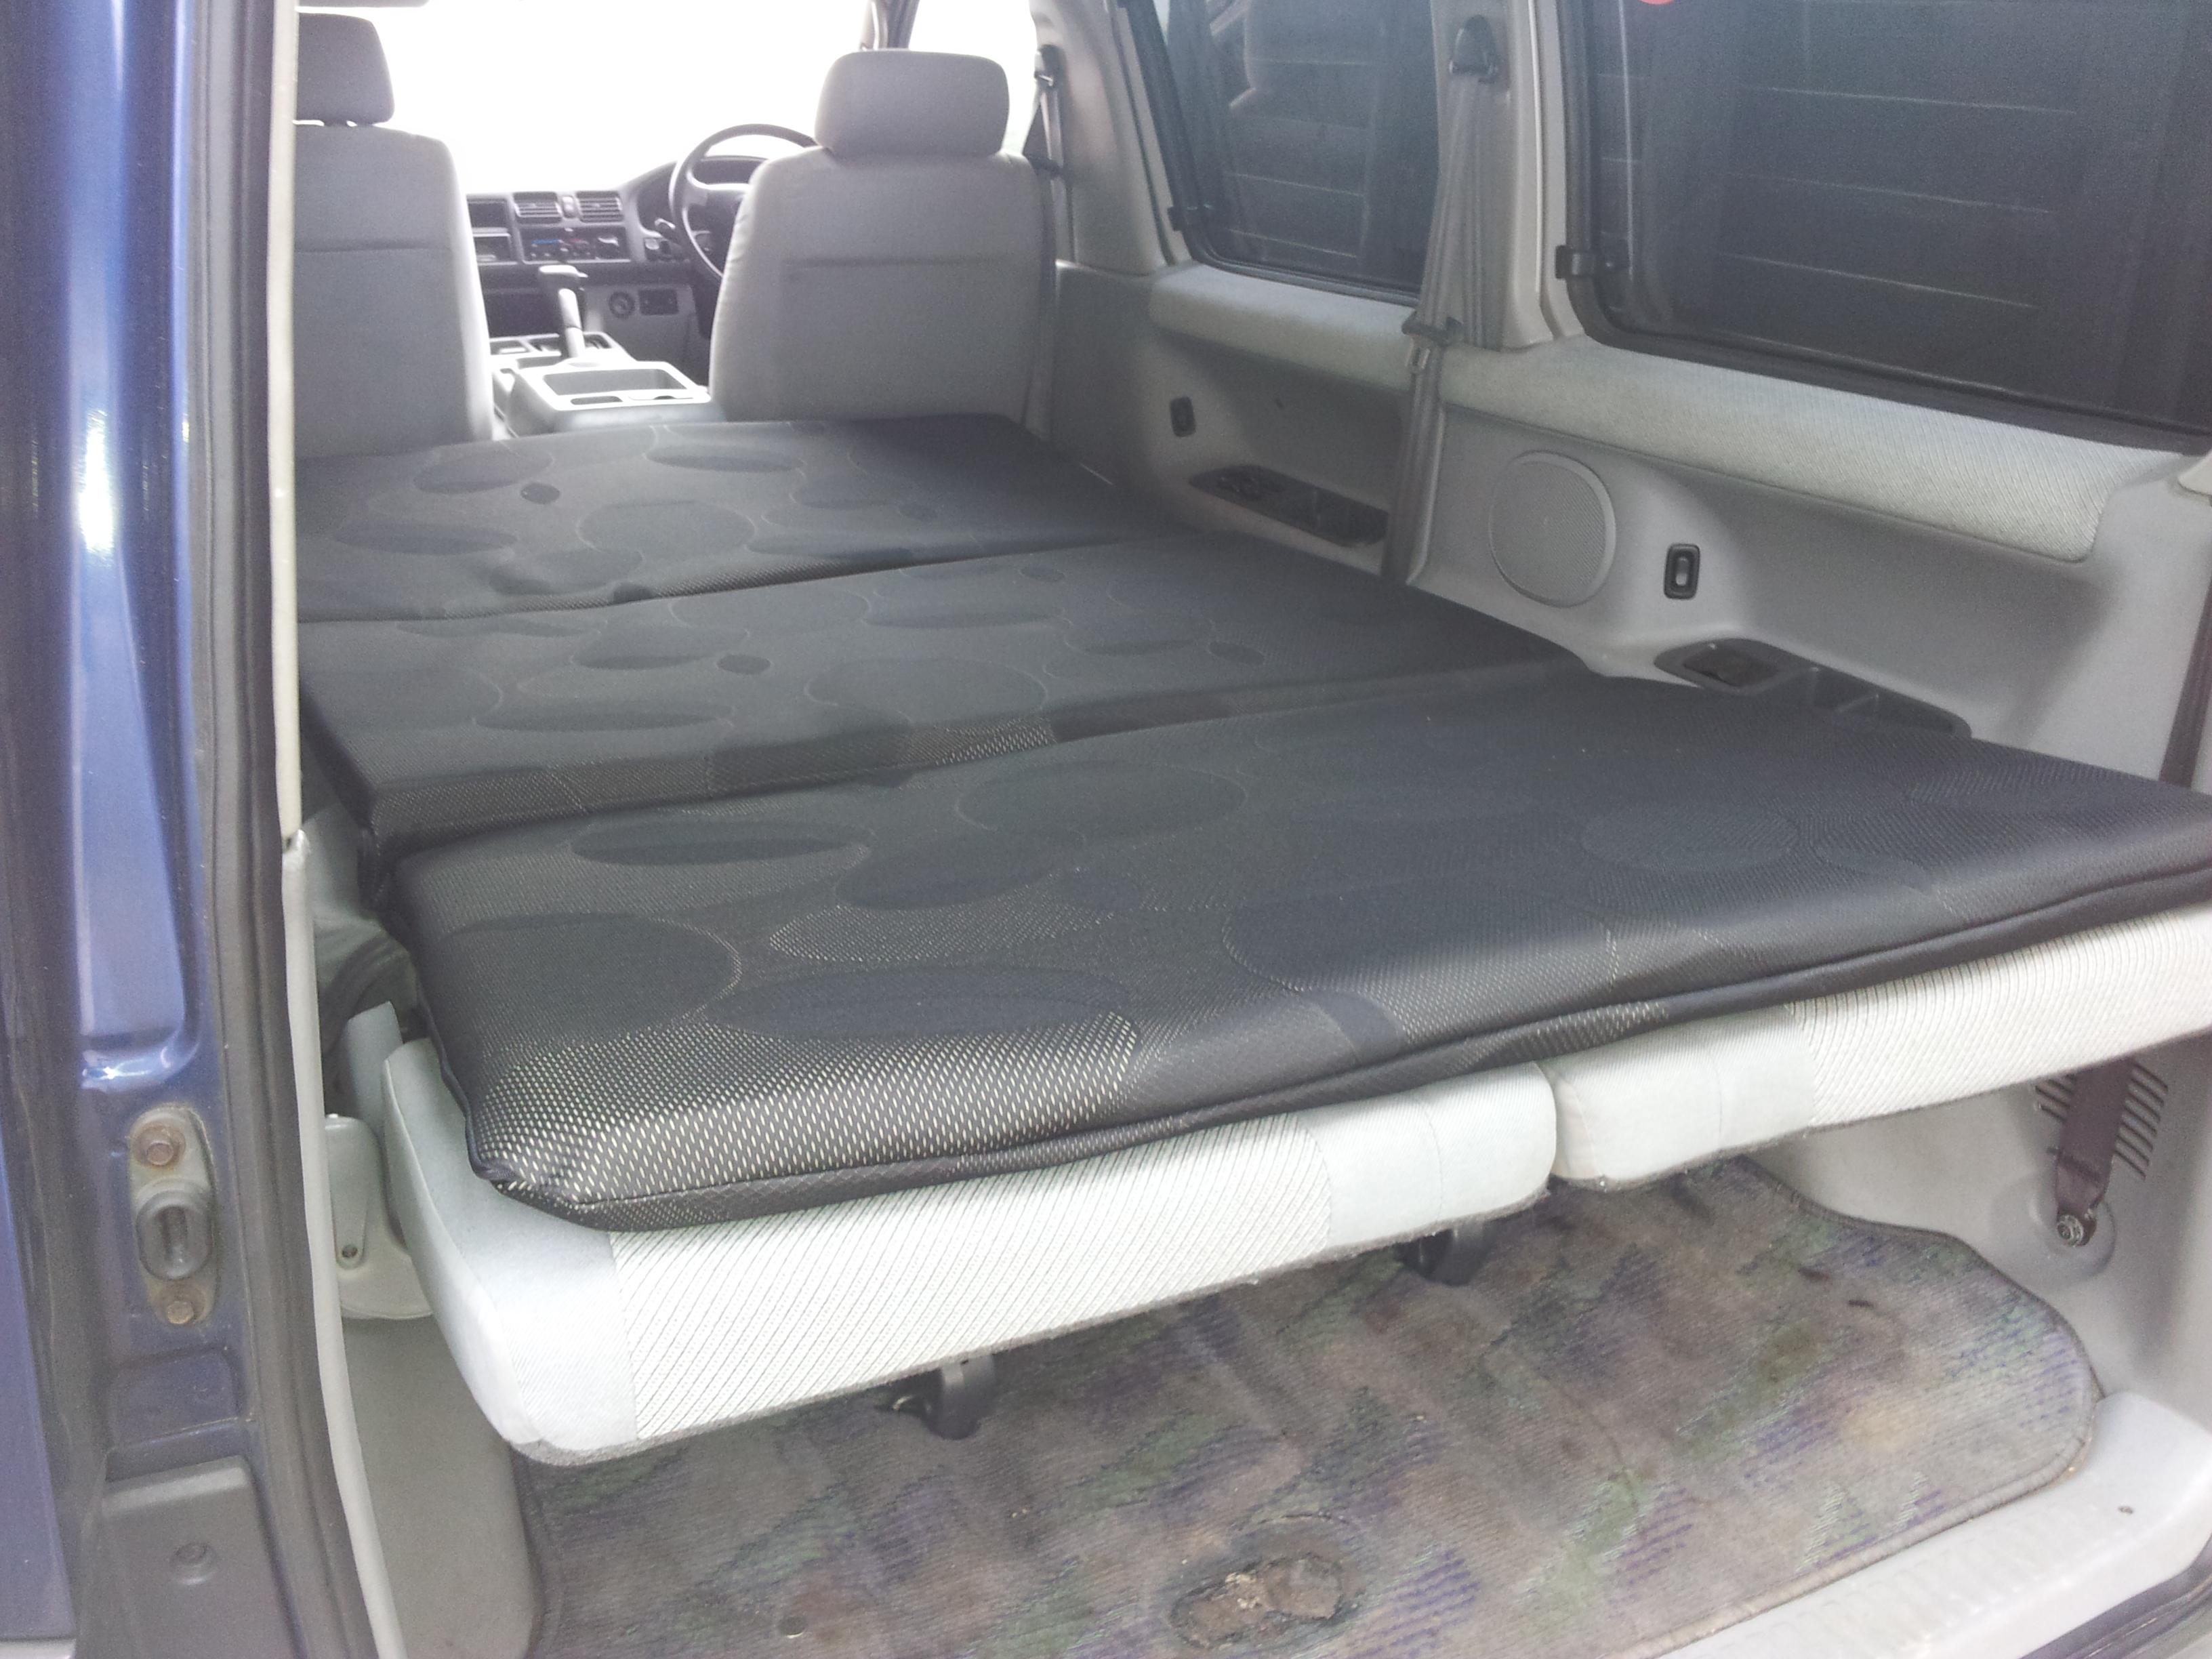 Memory Foam Mazda Bongo Ford Freda Cabin Mattress Topper